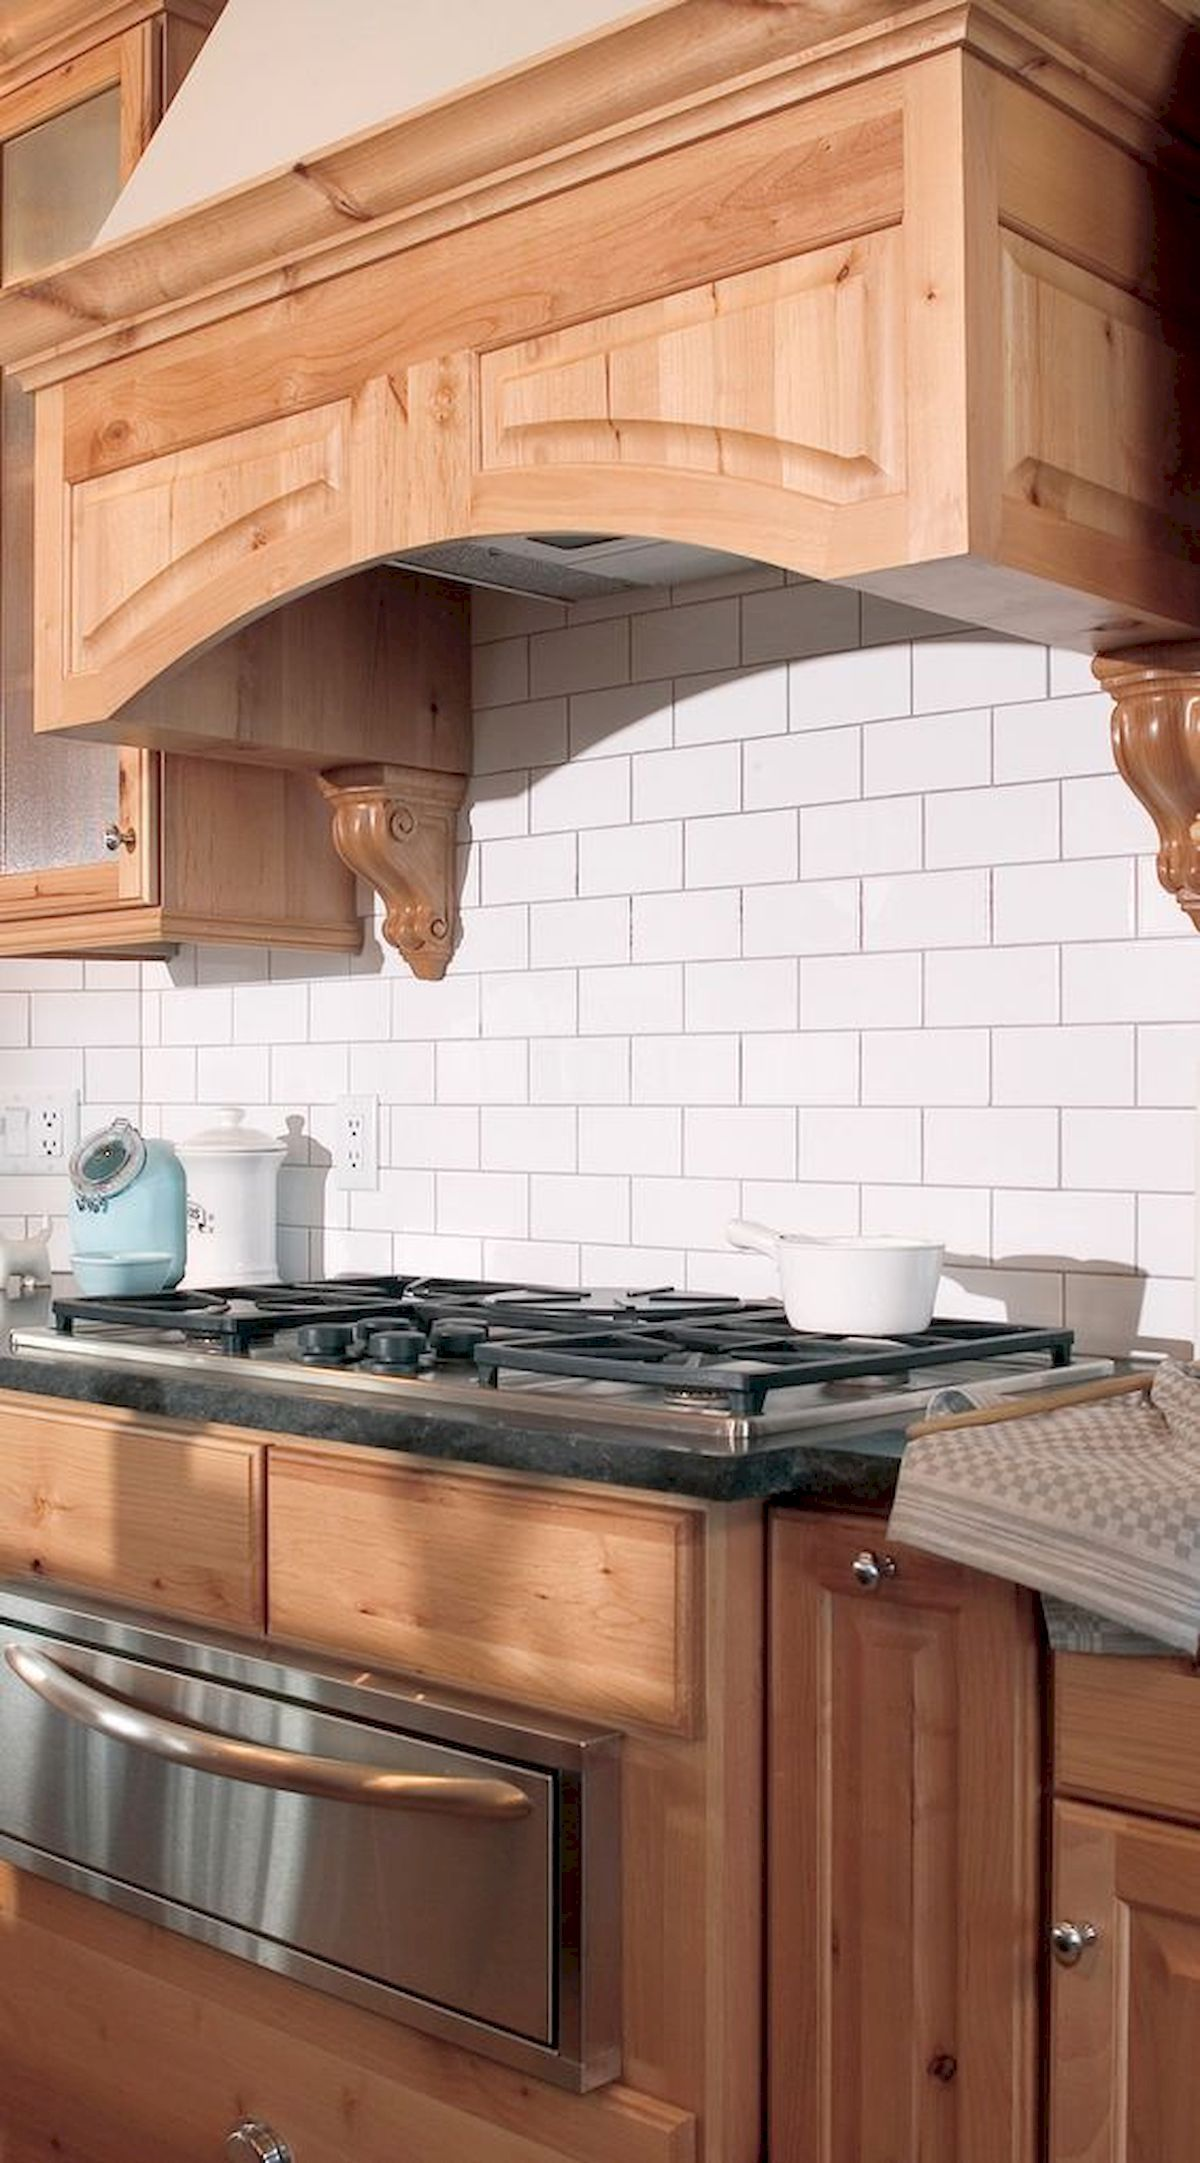 25 Best Farmhouse Master Bedroom Decor Ideas: 25 Best Subway Tile Kitchen For Farmhouse Ideas